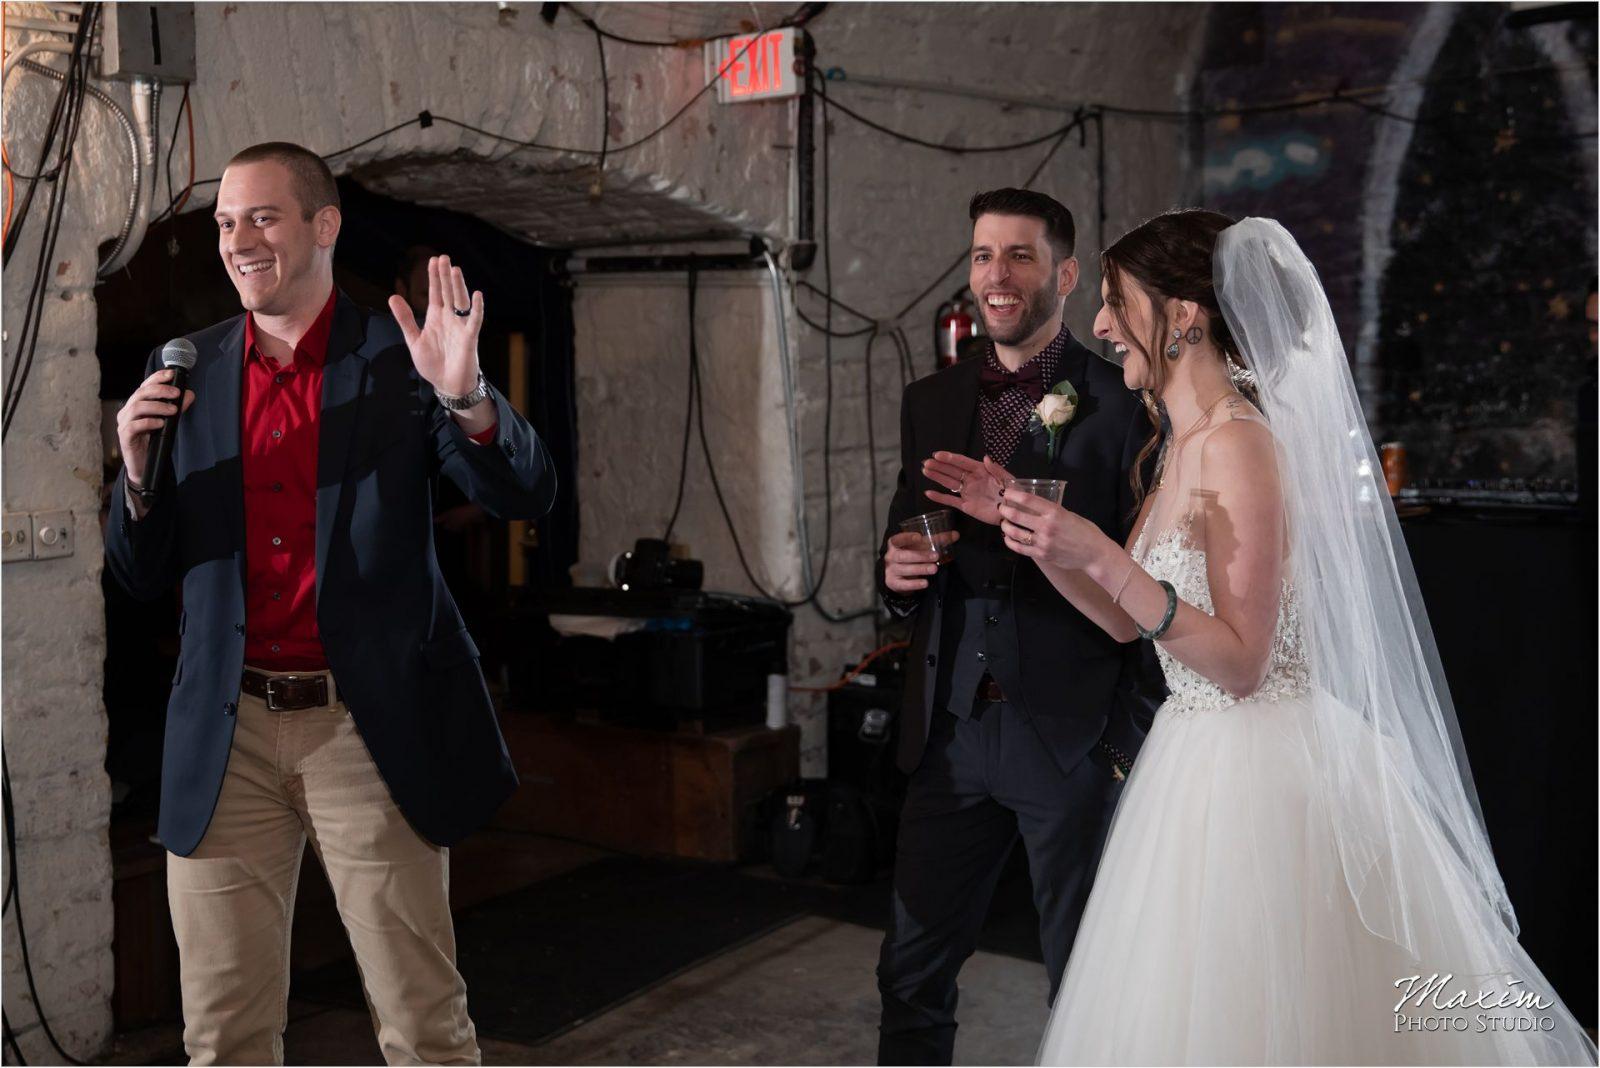 The Mockbee Cincinnati Wedding Reception